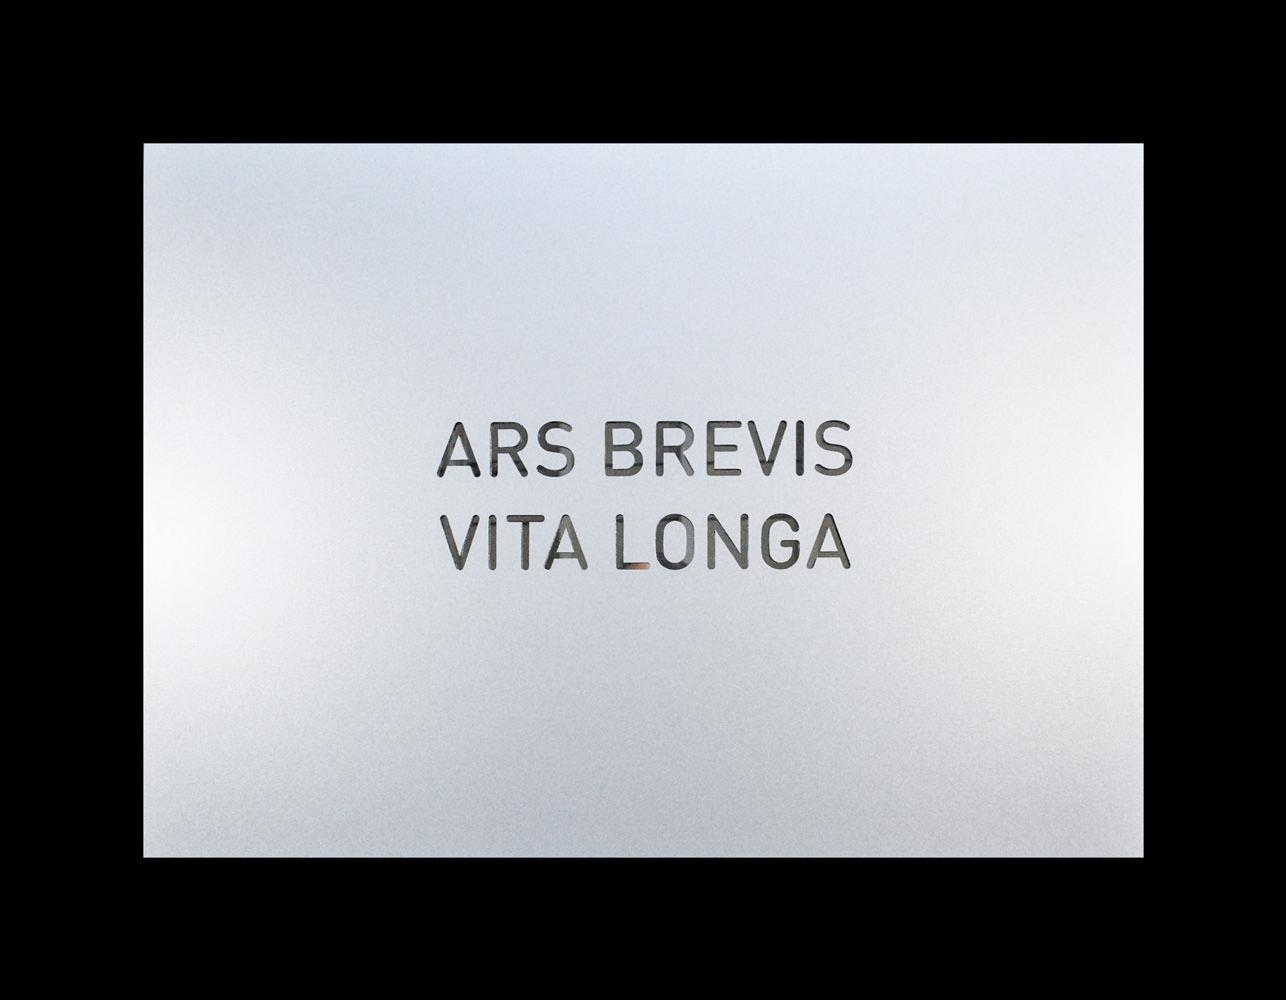 ars-brevis-vita-longa